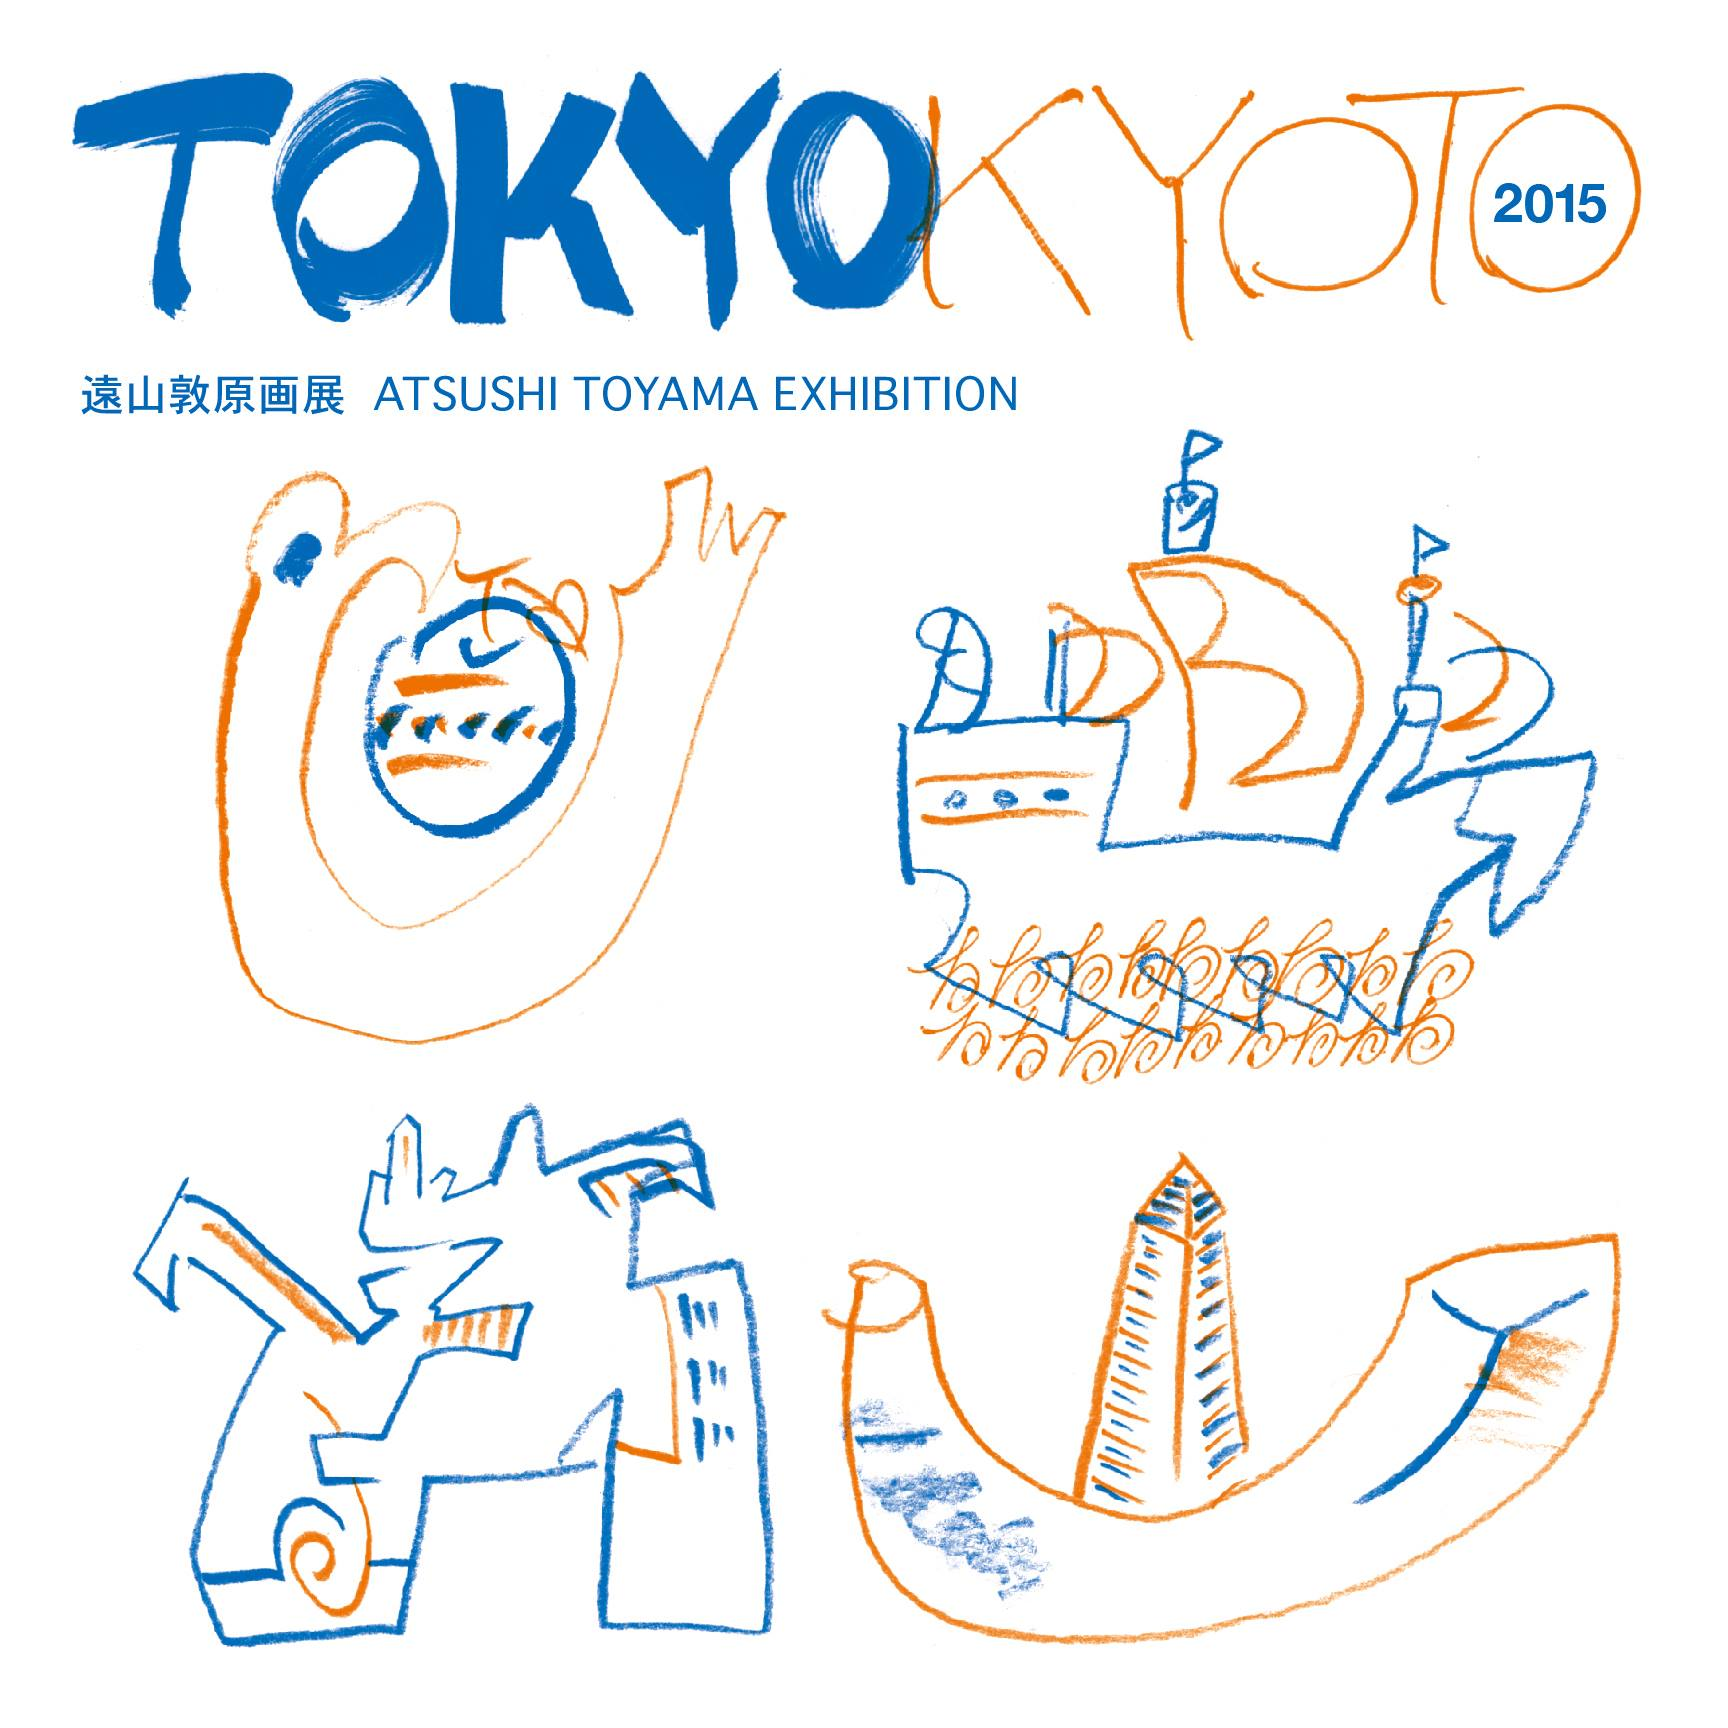 遠山敦原画展2015@H TOKYO